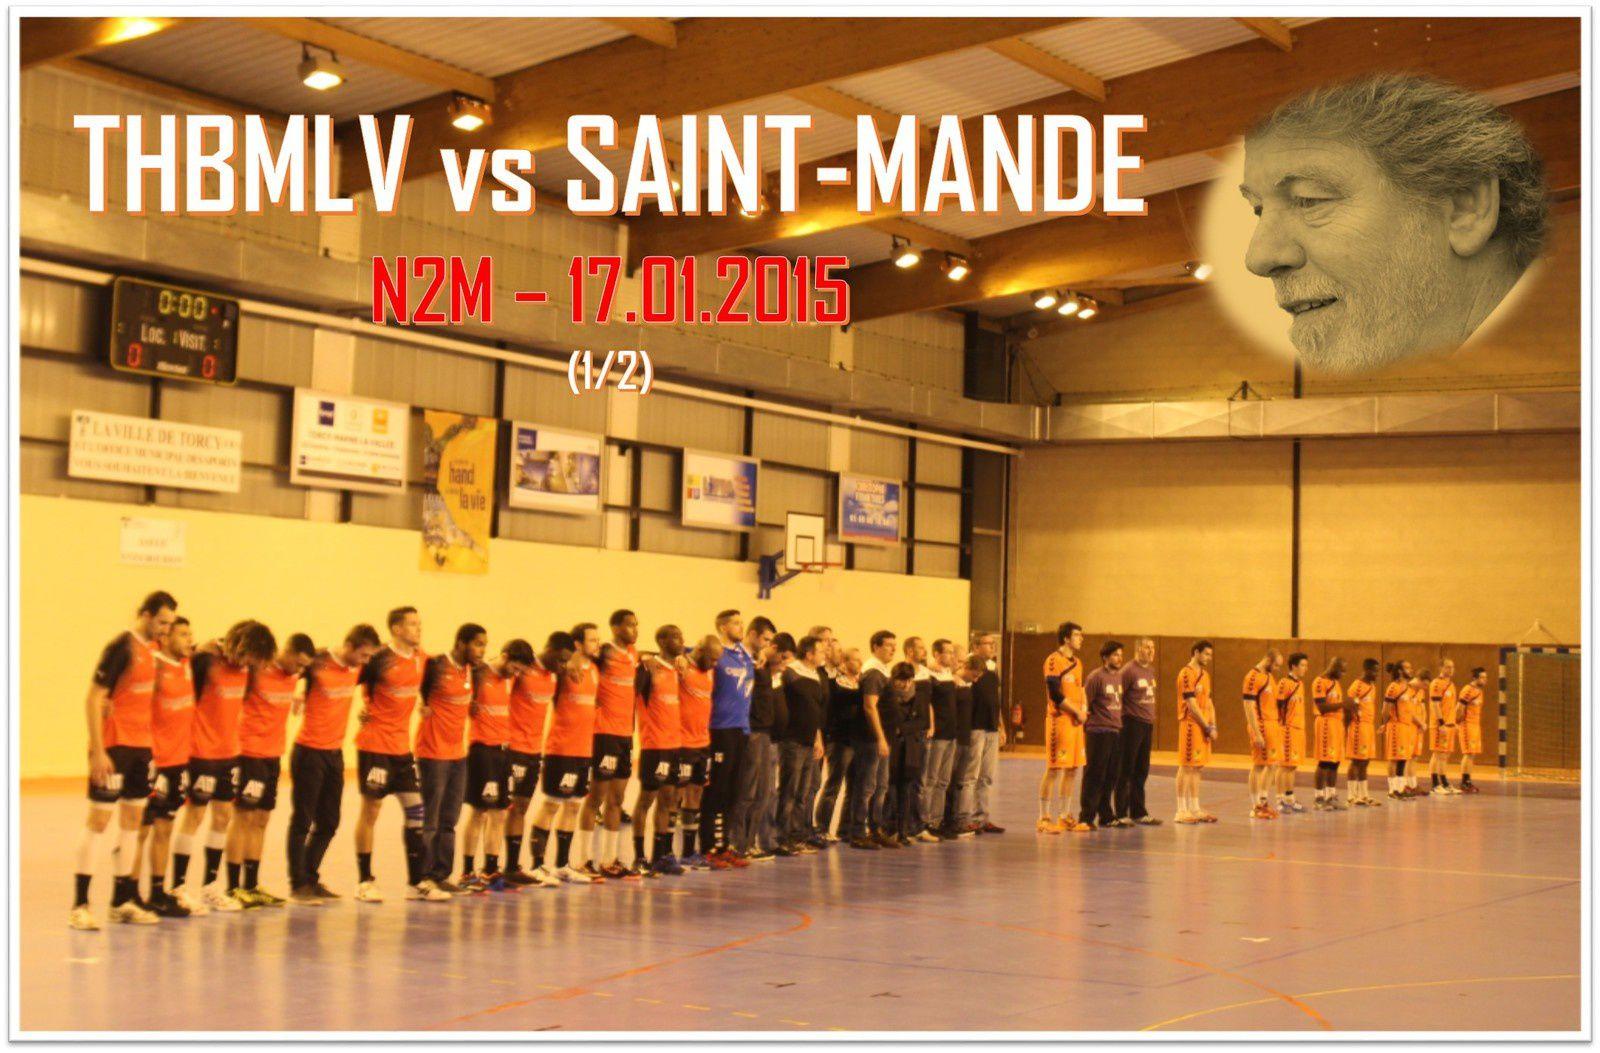 THBMLV vs SAINT-MANDE (N2M) 17.01.2015 (1/2)